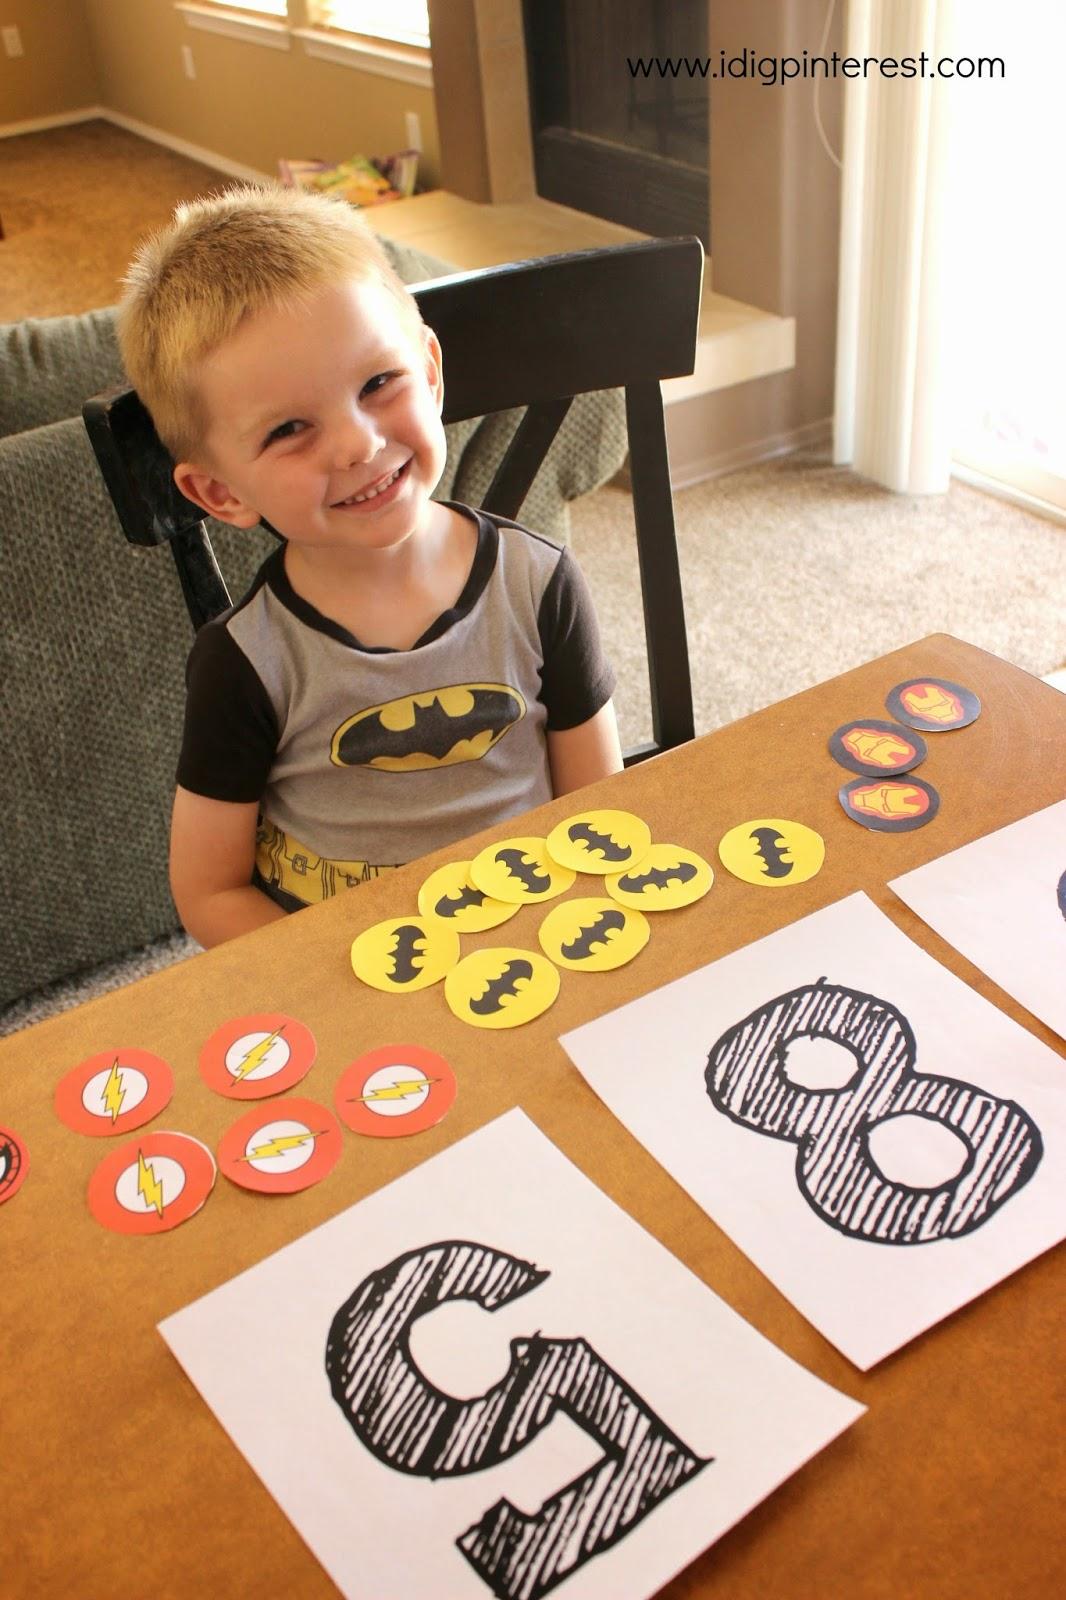 I Dig Pinterest Make Learning Fun With Disney Jr